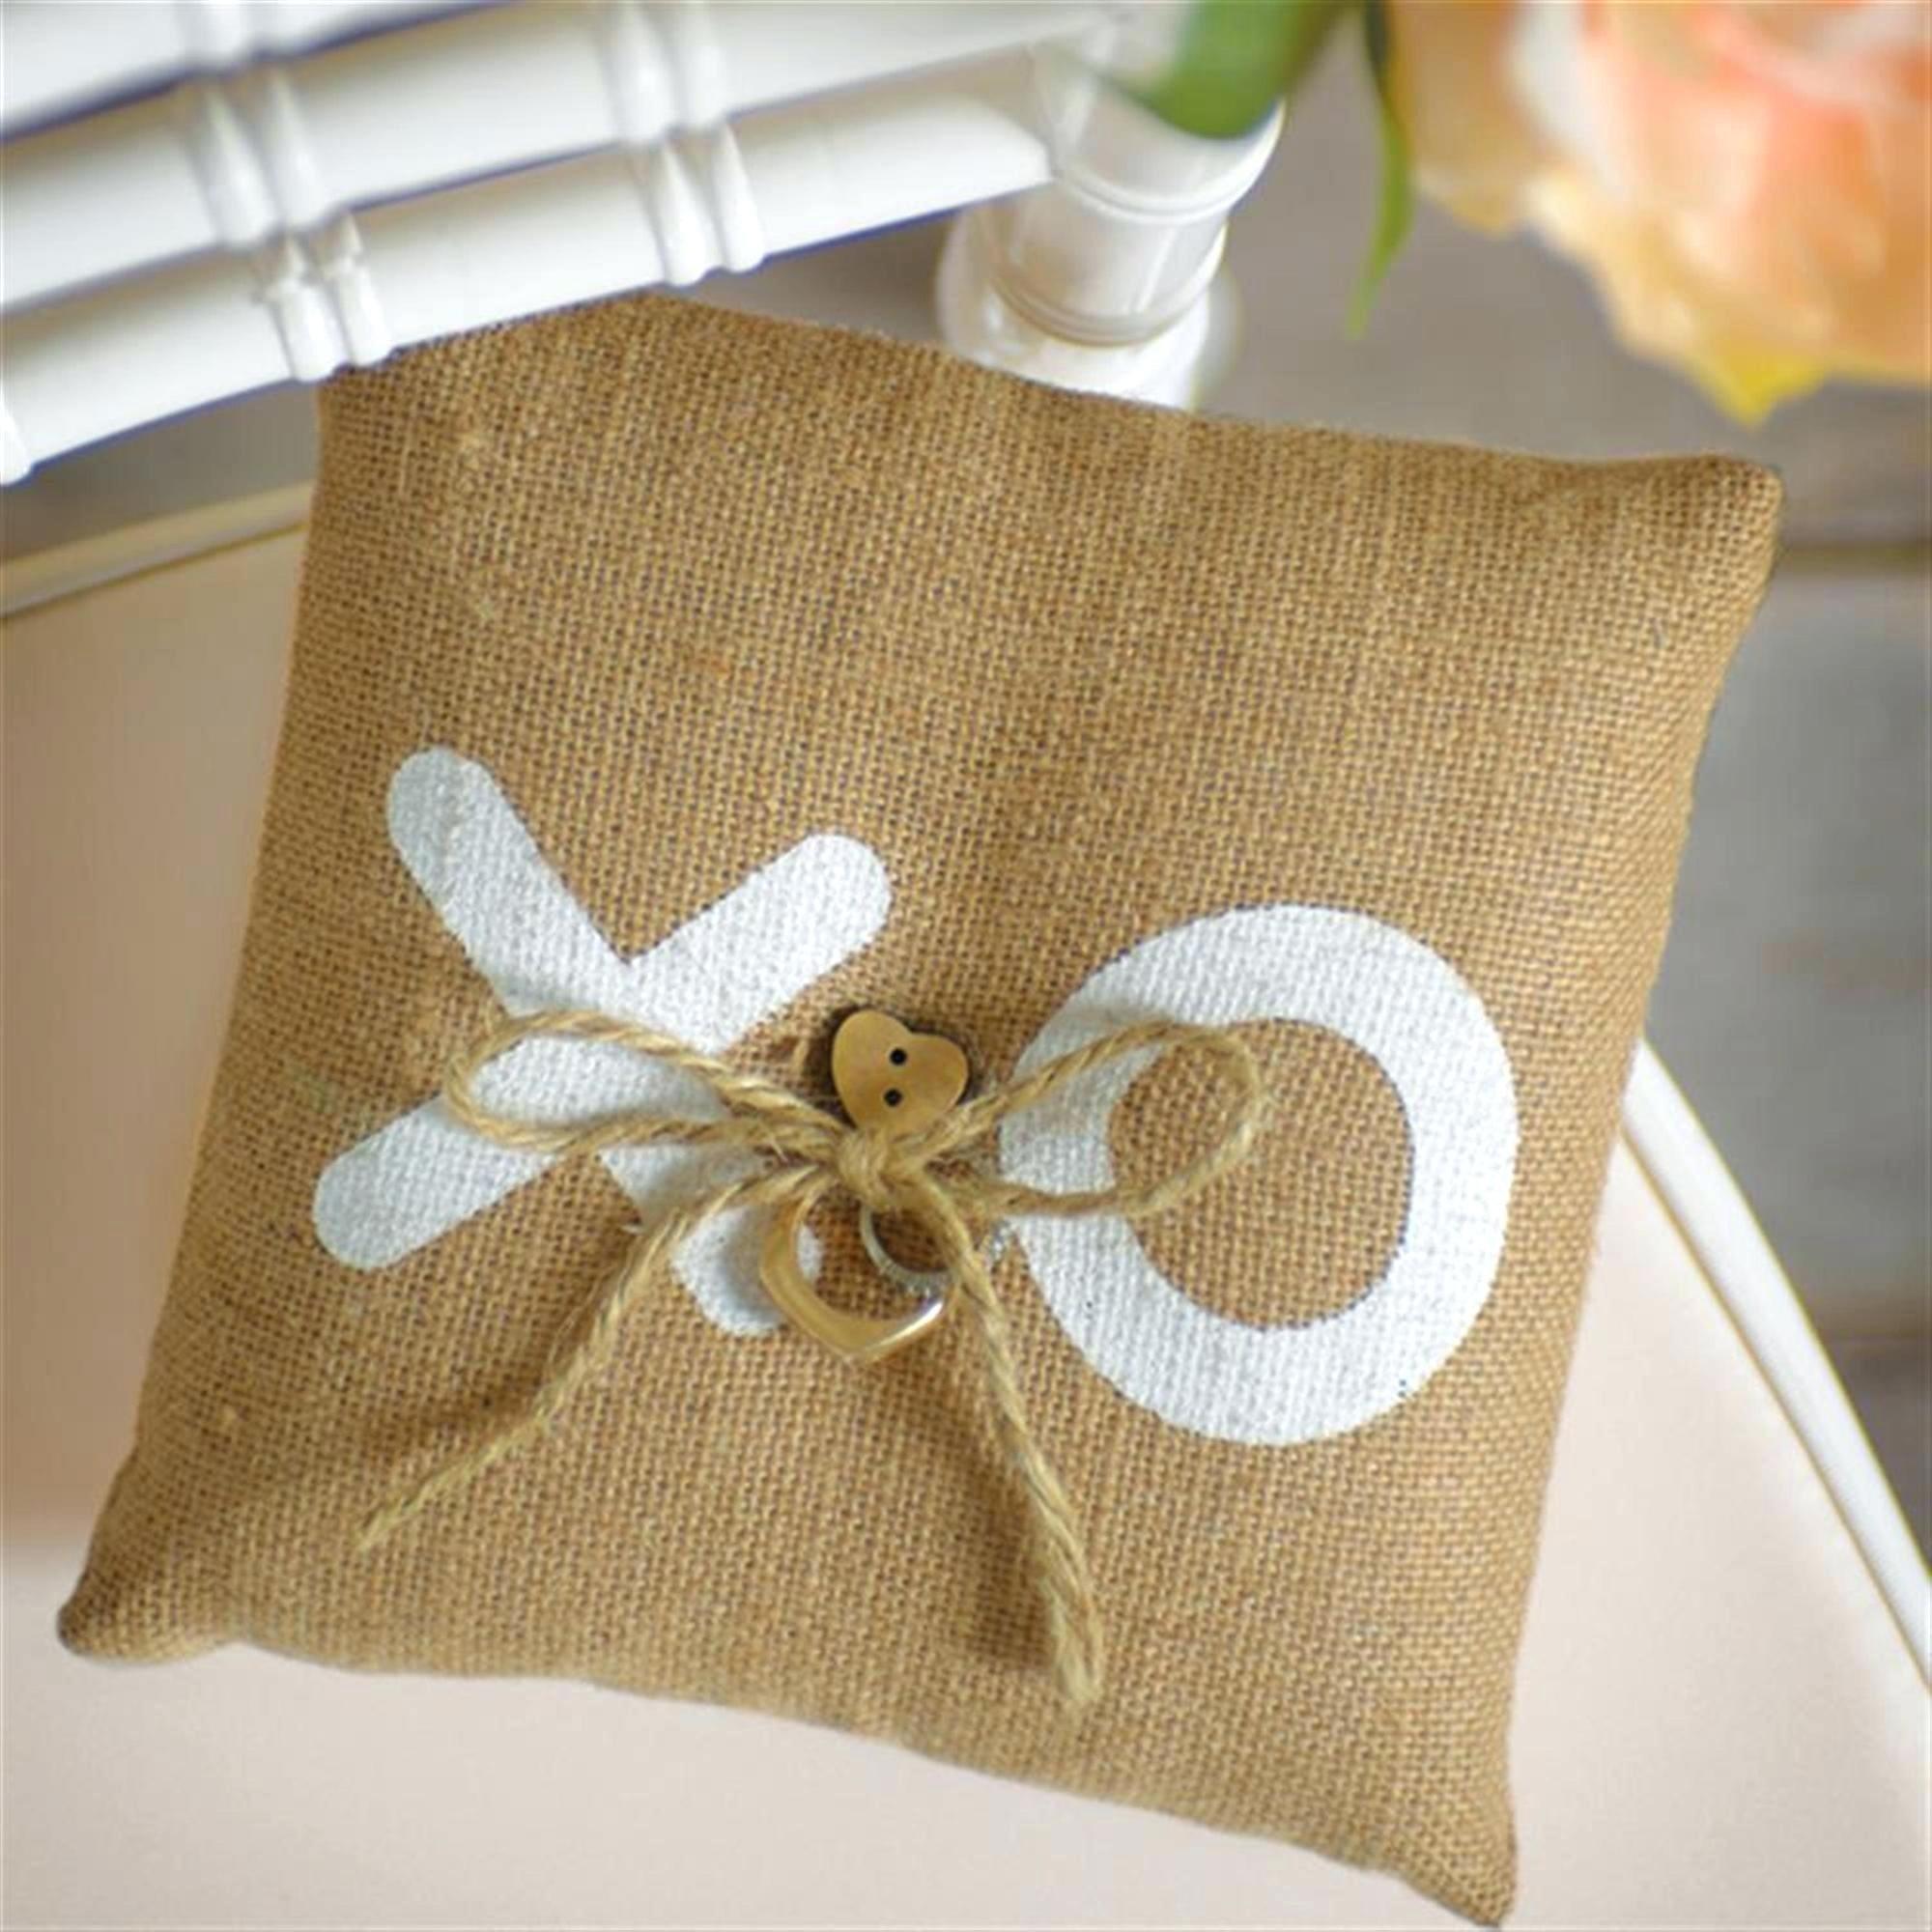 10 Beautiful Ring Bearer Ideas Alternatives To Pillow ring bearer pillow ring bearer pillow diy niptuckfrance 2020